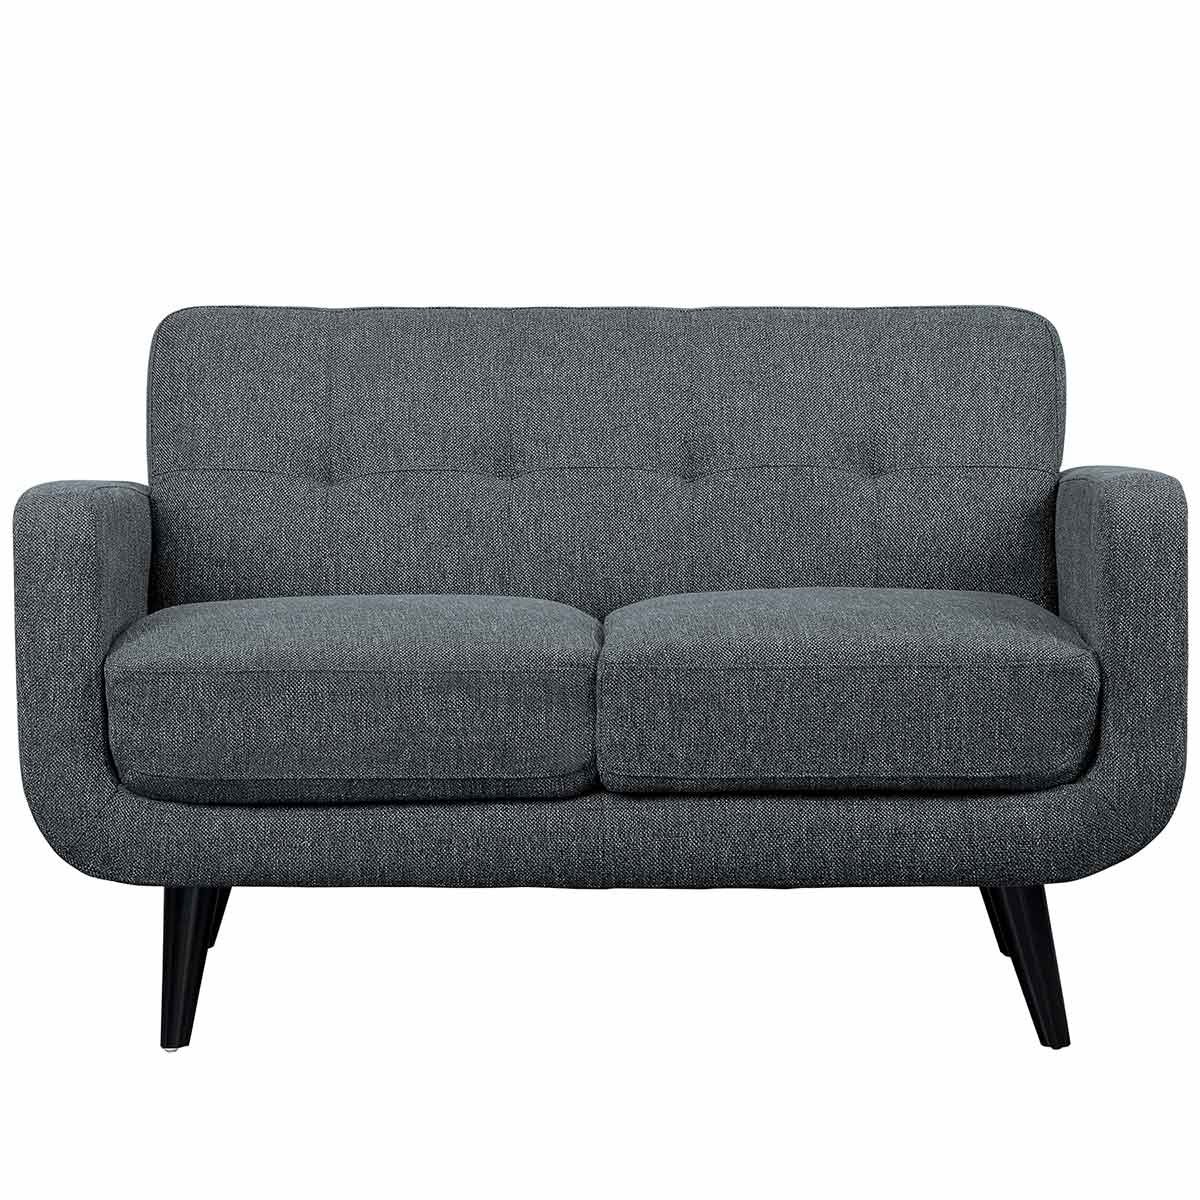 Homelegance Monroe Love Seat - Gray